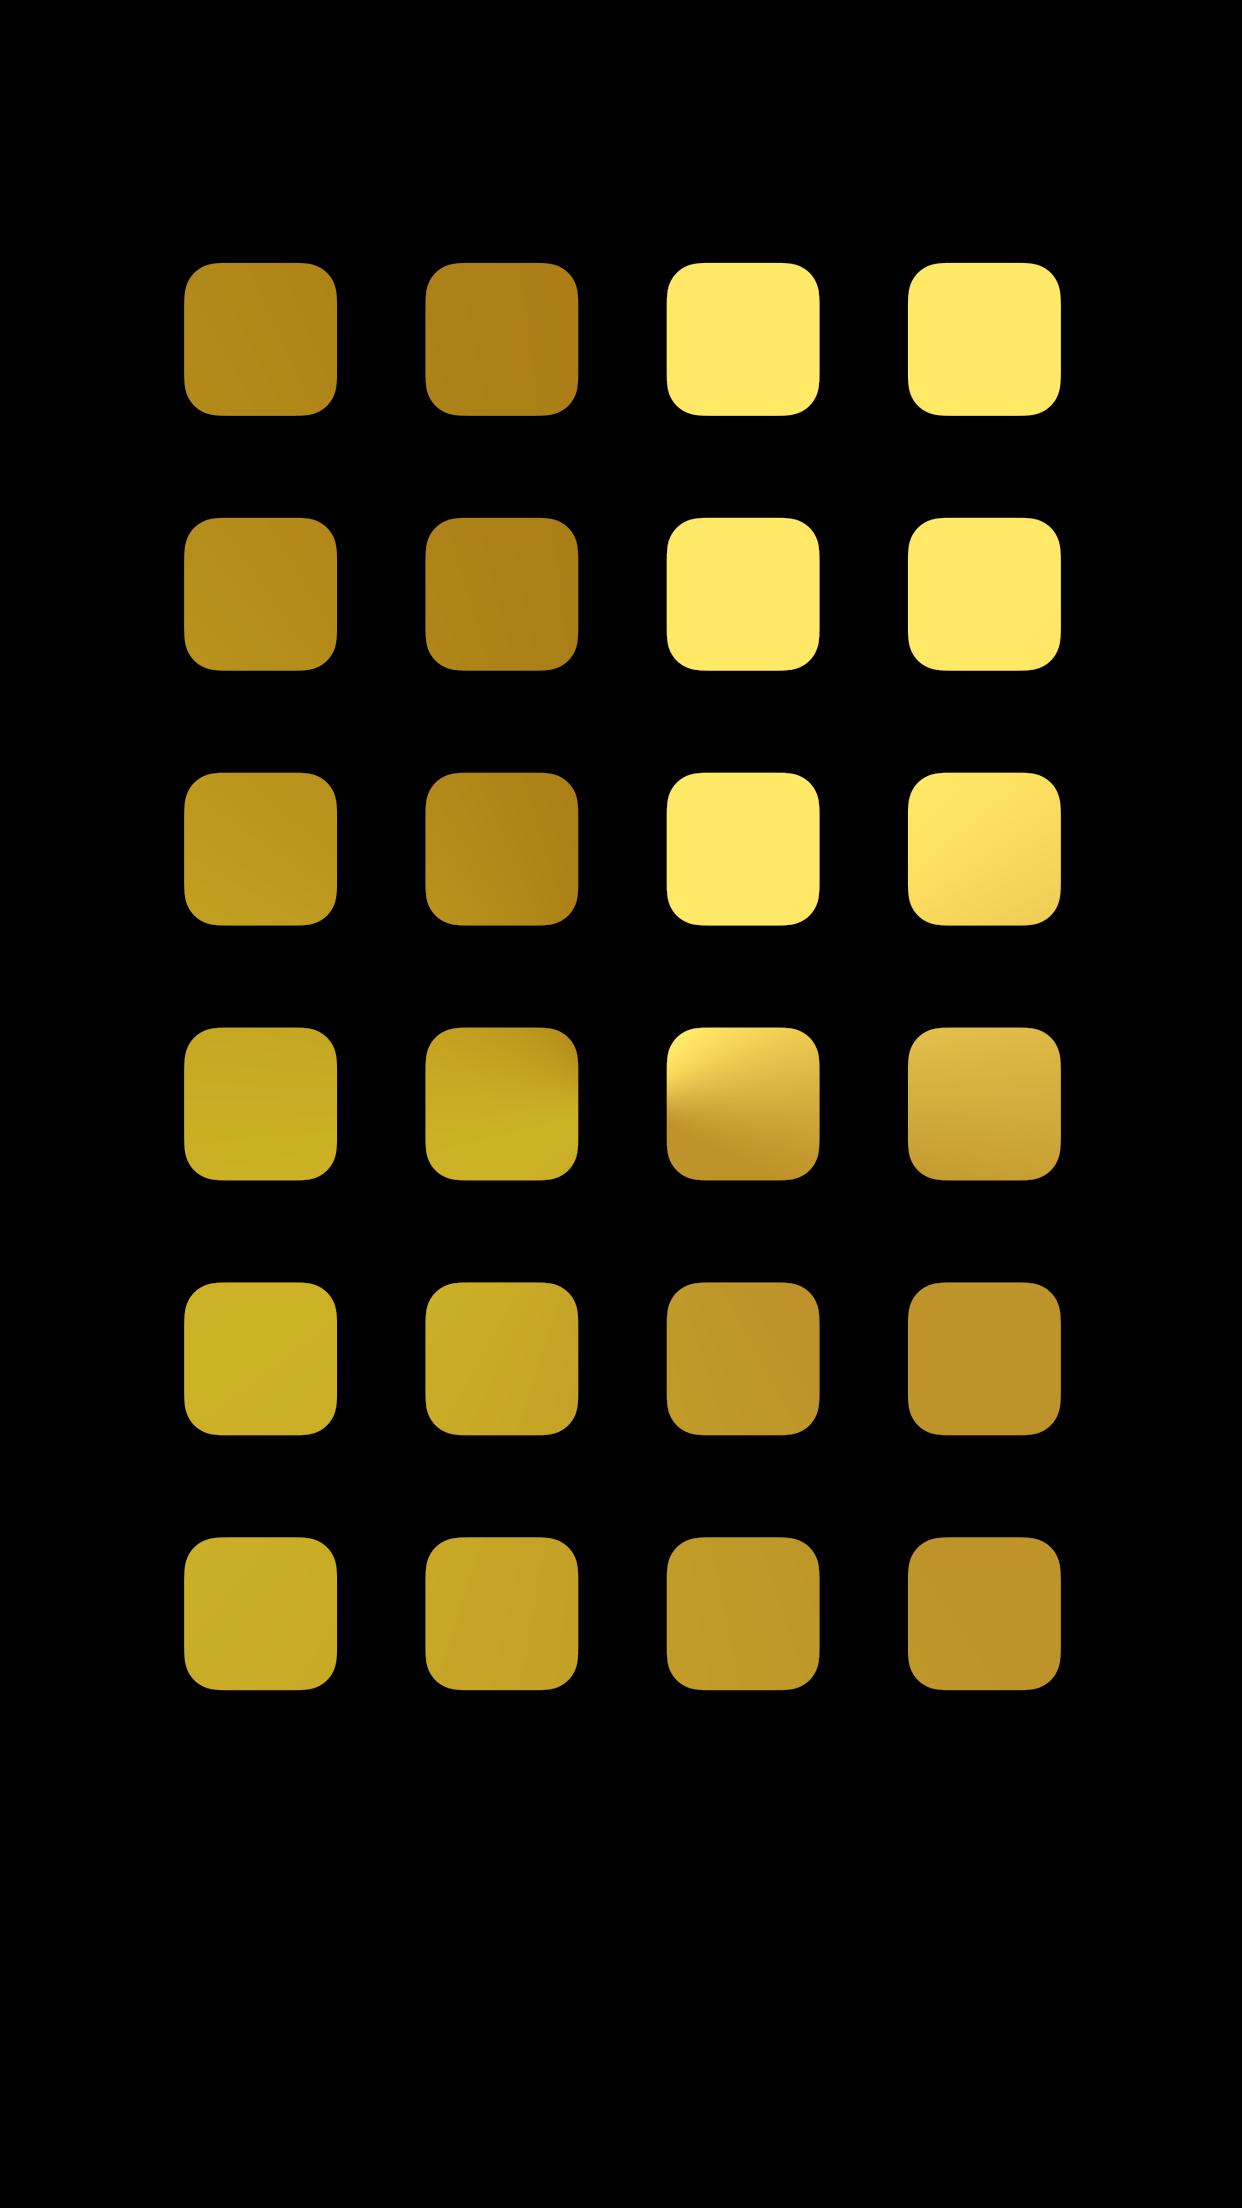 Iphone6 Plus棚の壁紙 ブラックゴールド Black Gold Wallpaper To Iphone6 Plus Shelf Type Wallpaper